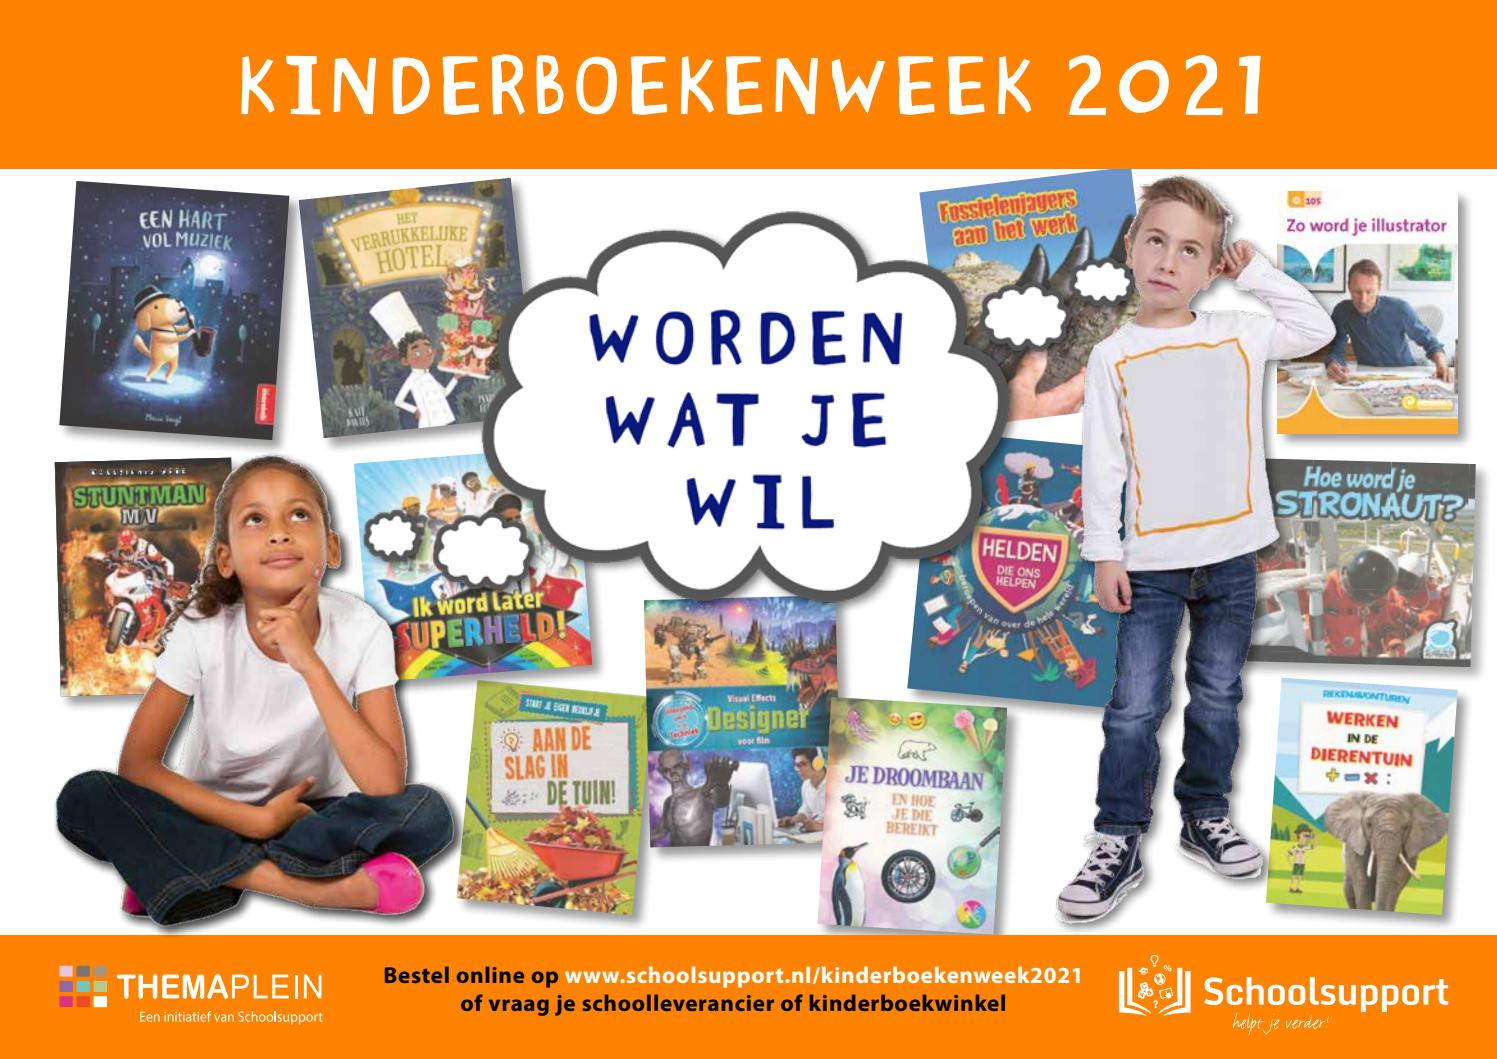 Leespakketten Kinderboekenweek 2021 by Schoolsupport - issuu